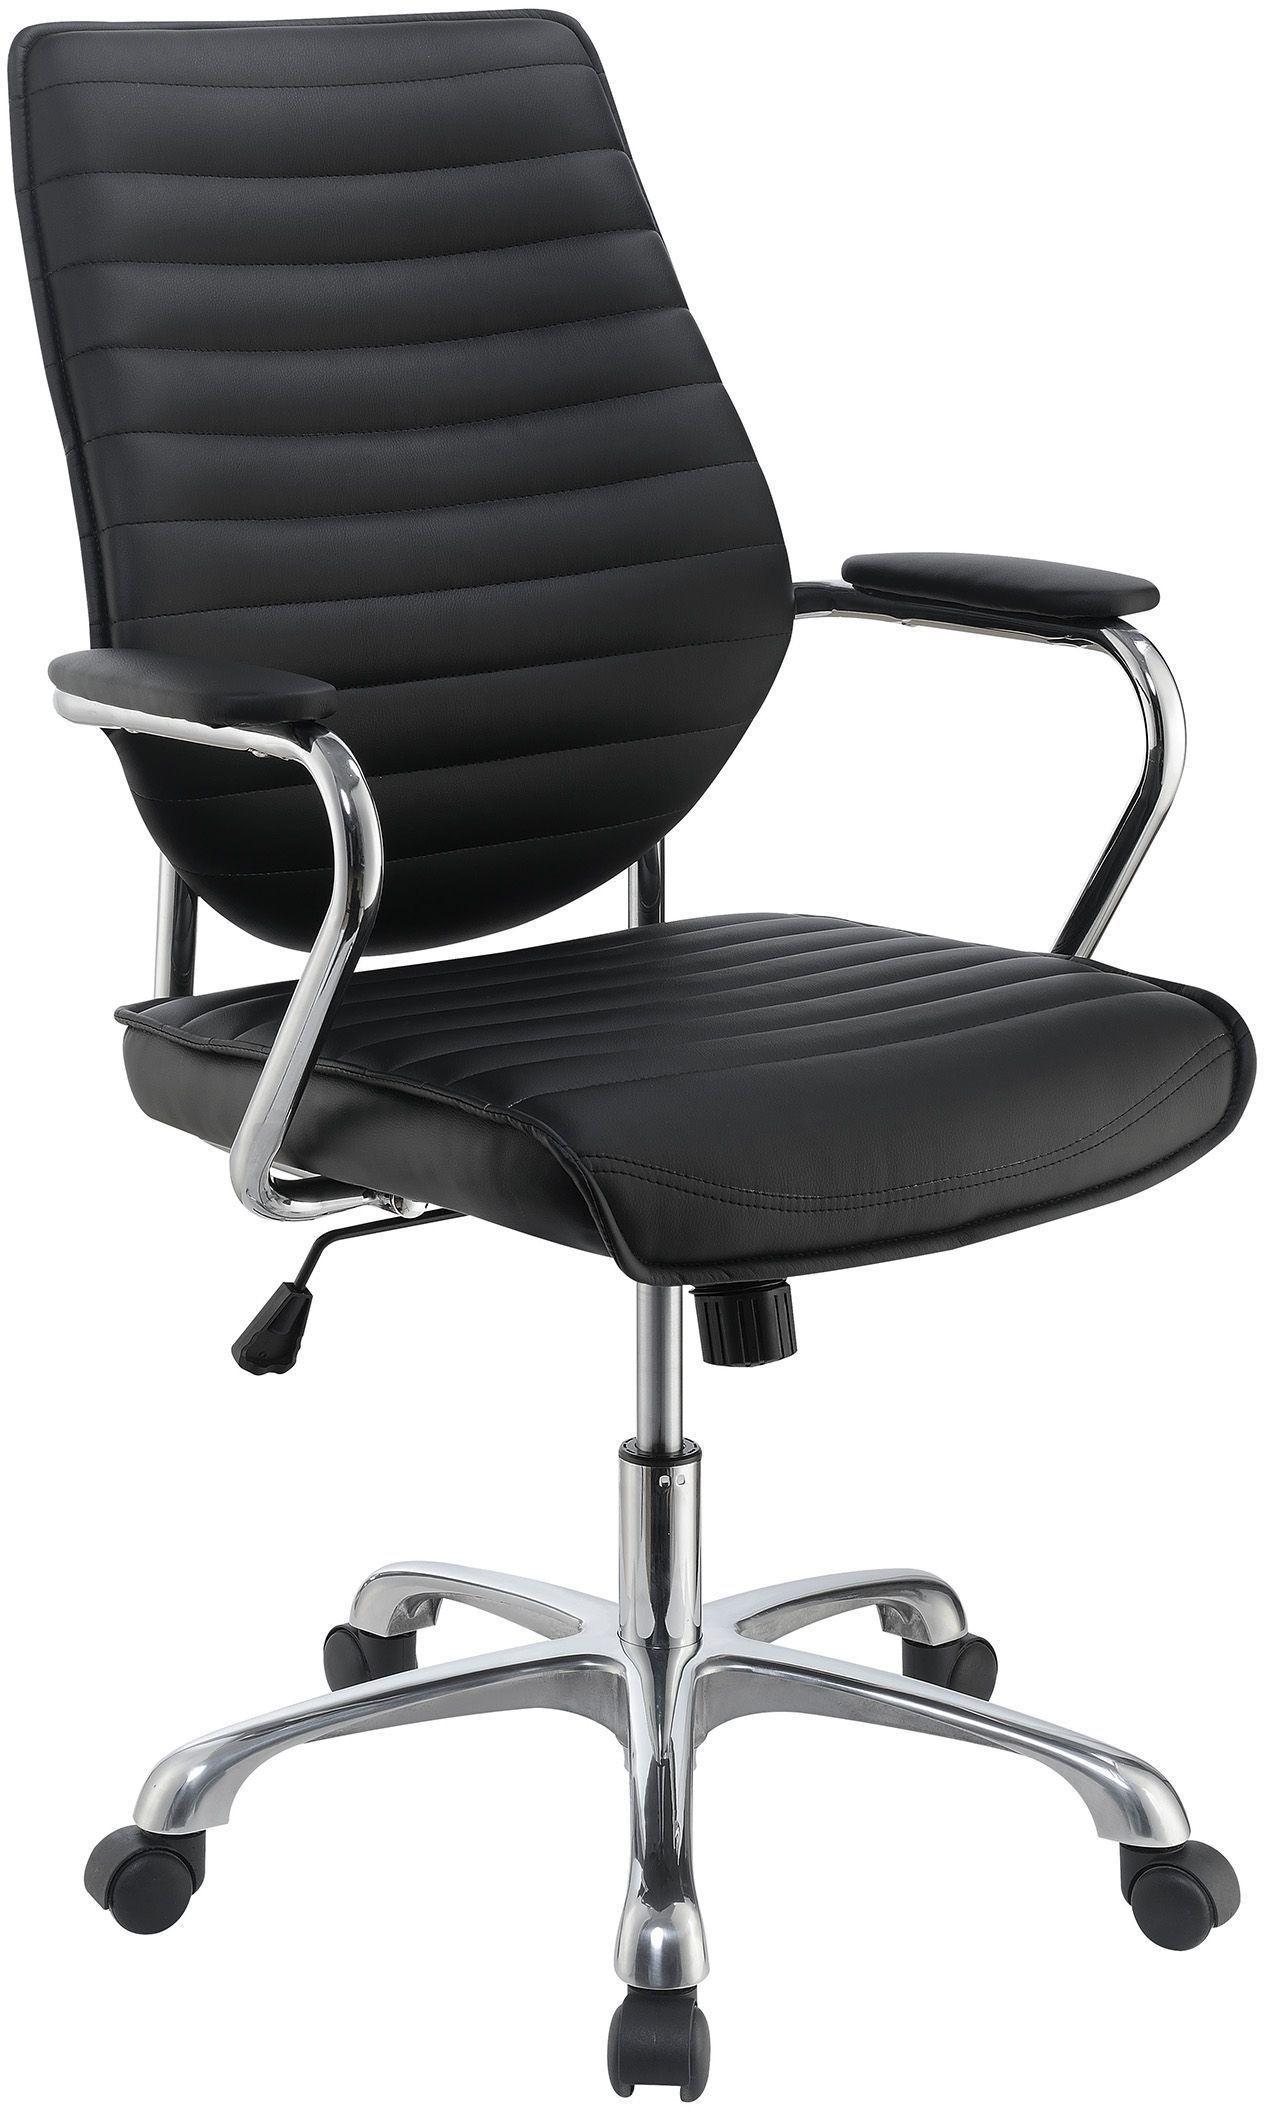 black high back adjustable upholstered office chair by scott living from coaster coleman furniture. Black Bedroom Furniture Sets. Home Design Ideas